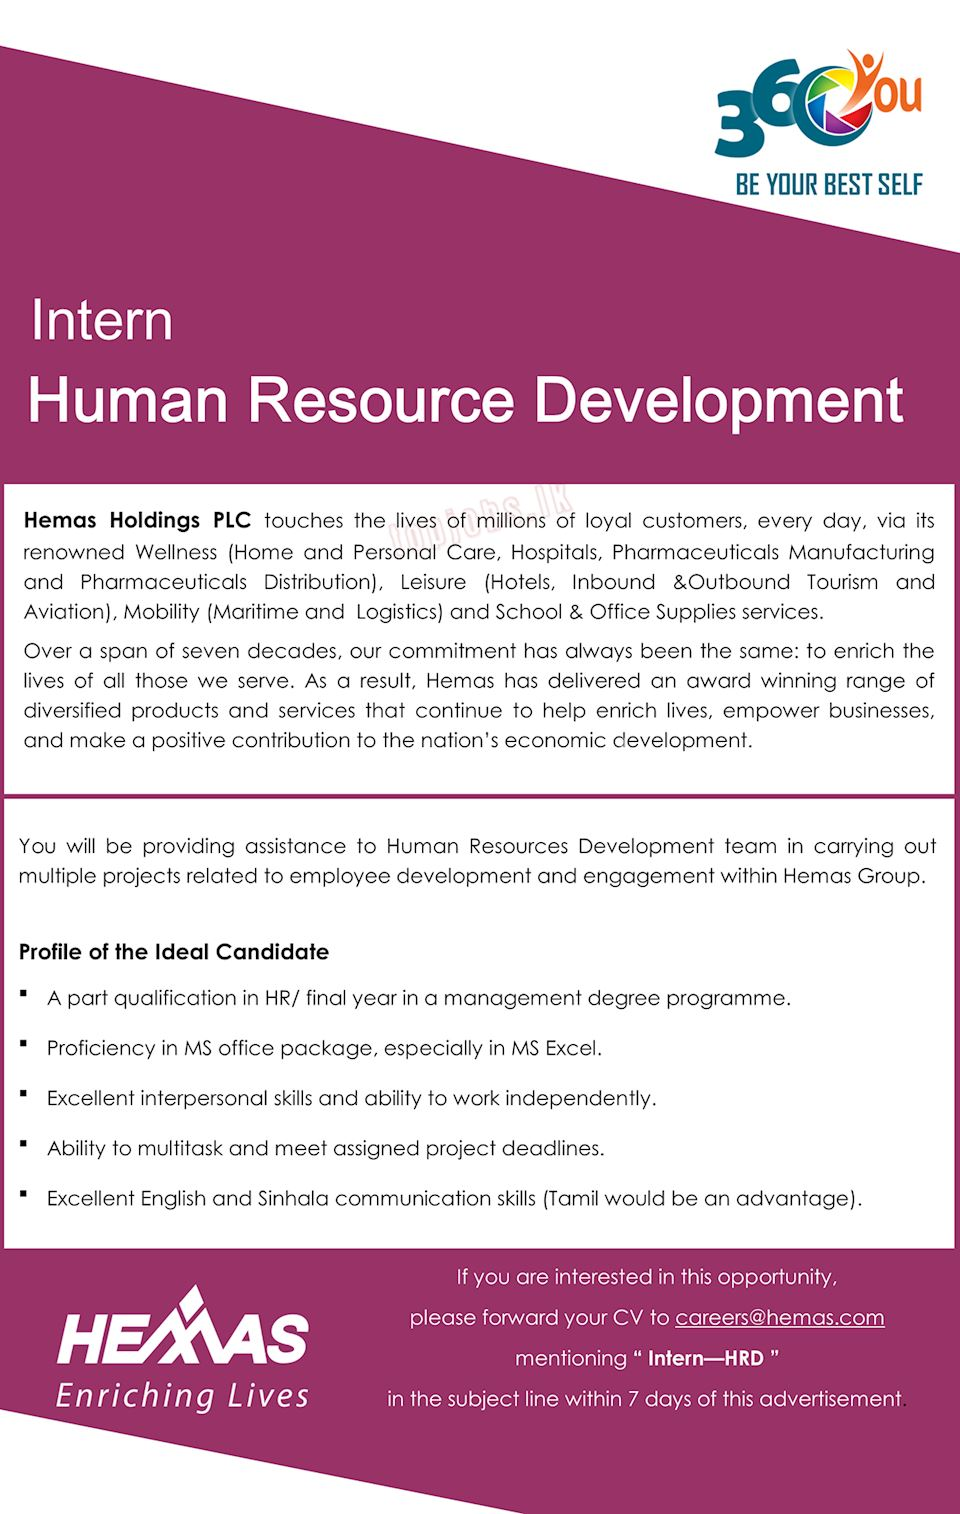 Intern - Human Resource Development